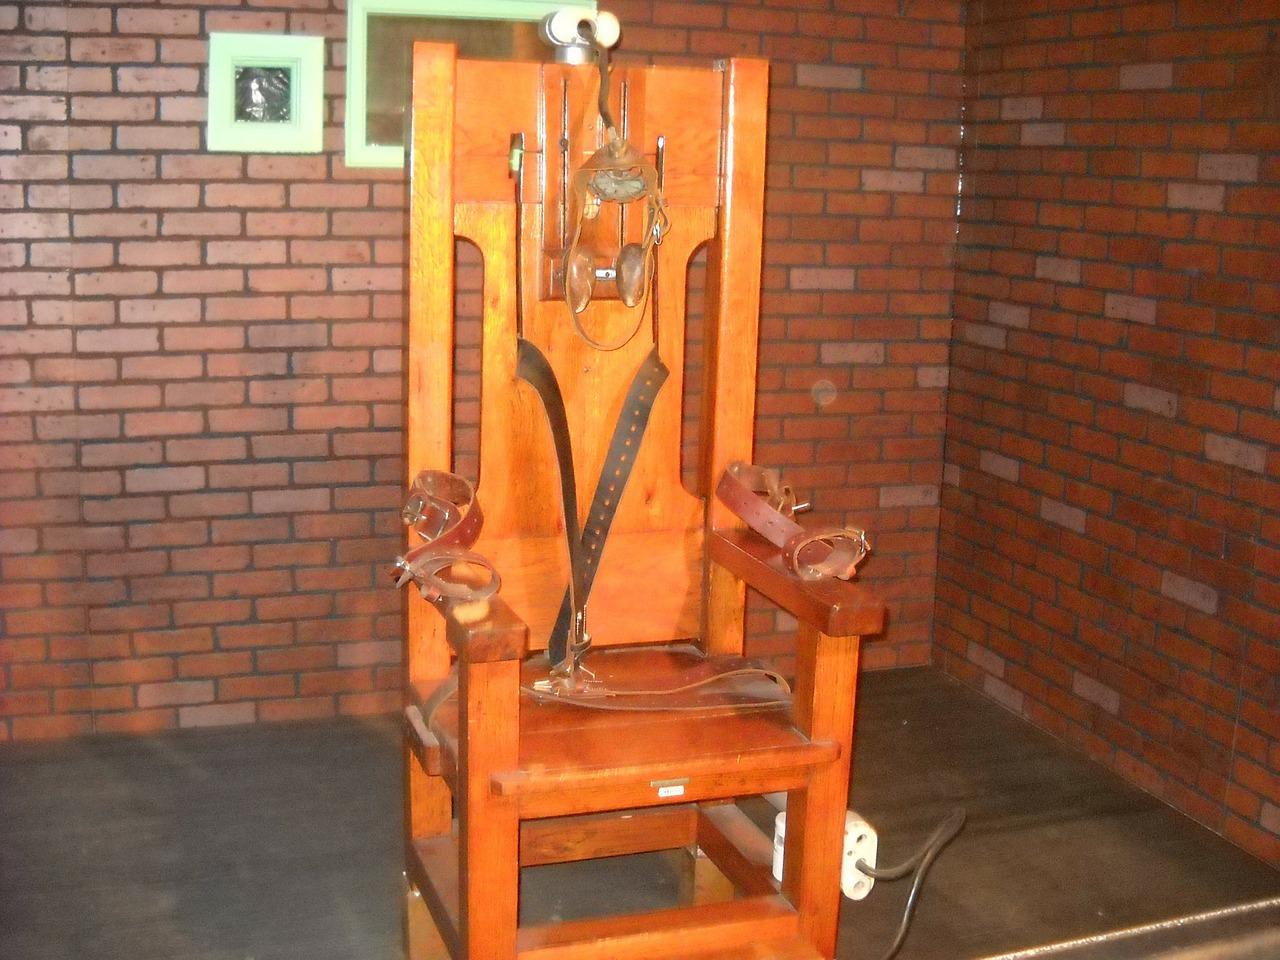 De doodstraf in Amerika